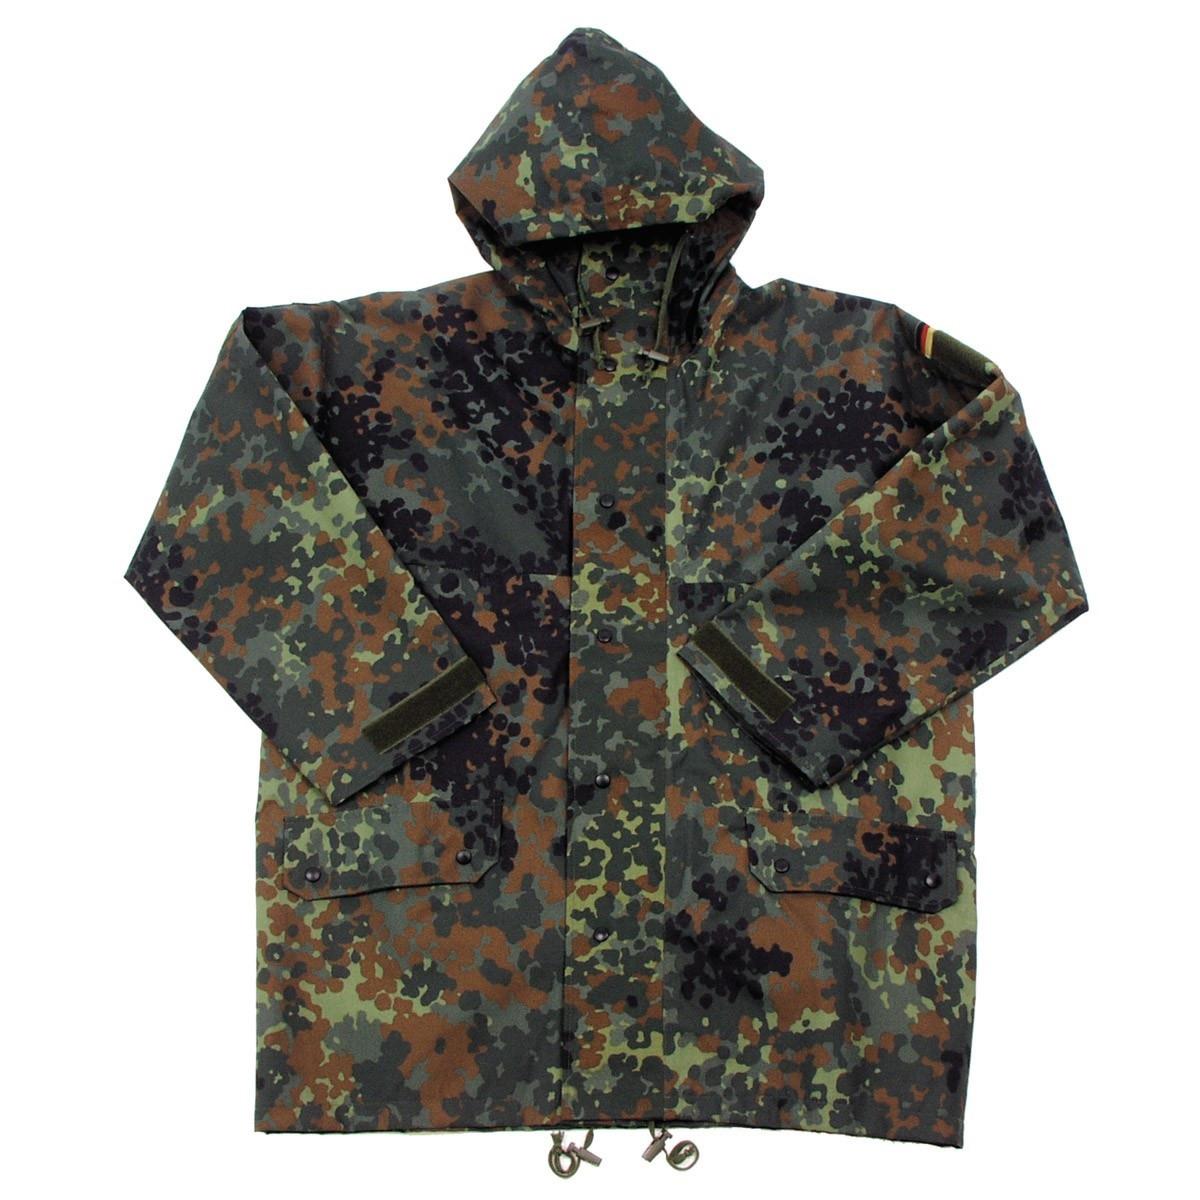 Куртка  с капюшоном  Goretex BW (флектарн). Германия 1  сорт